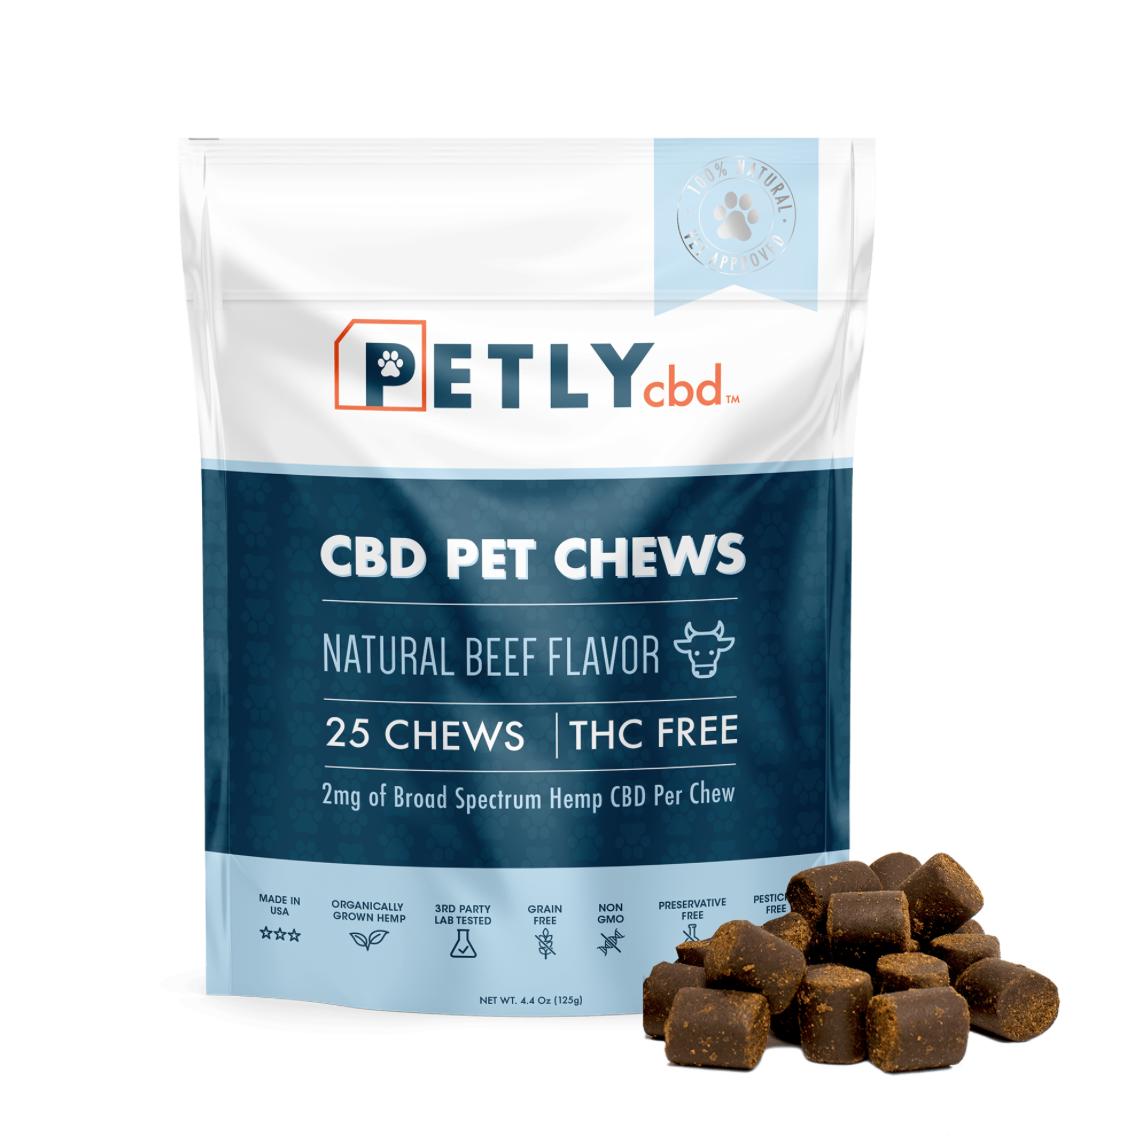 PETLYcbd Pet Chews